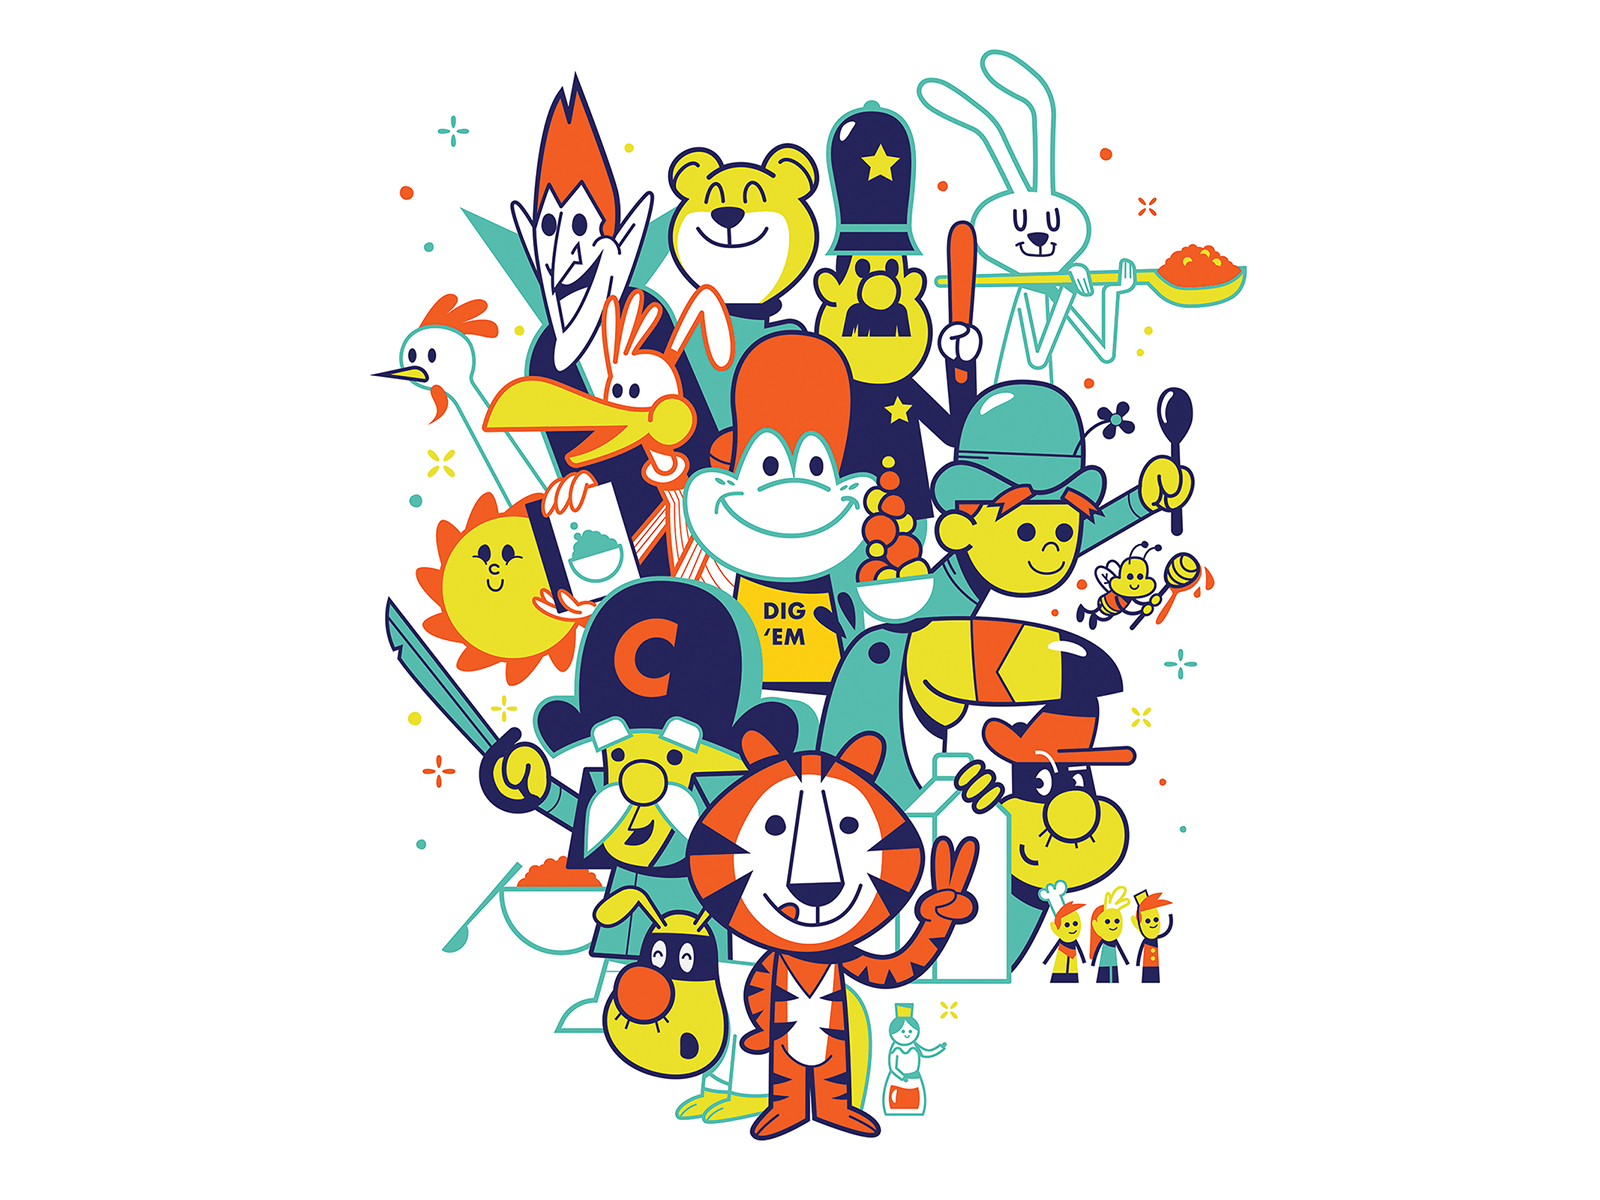 Cereal Mascots by Tony Bui on Dribbble